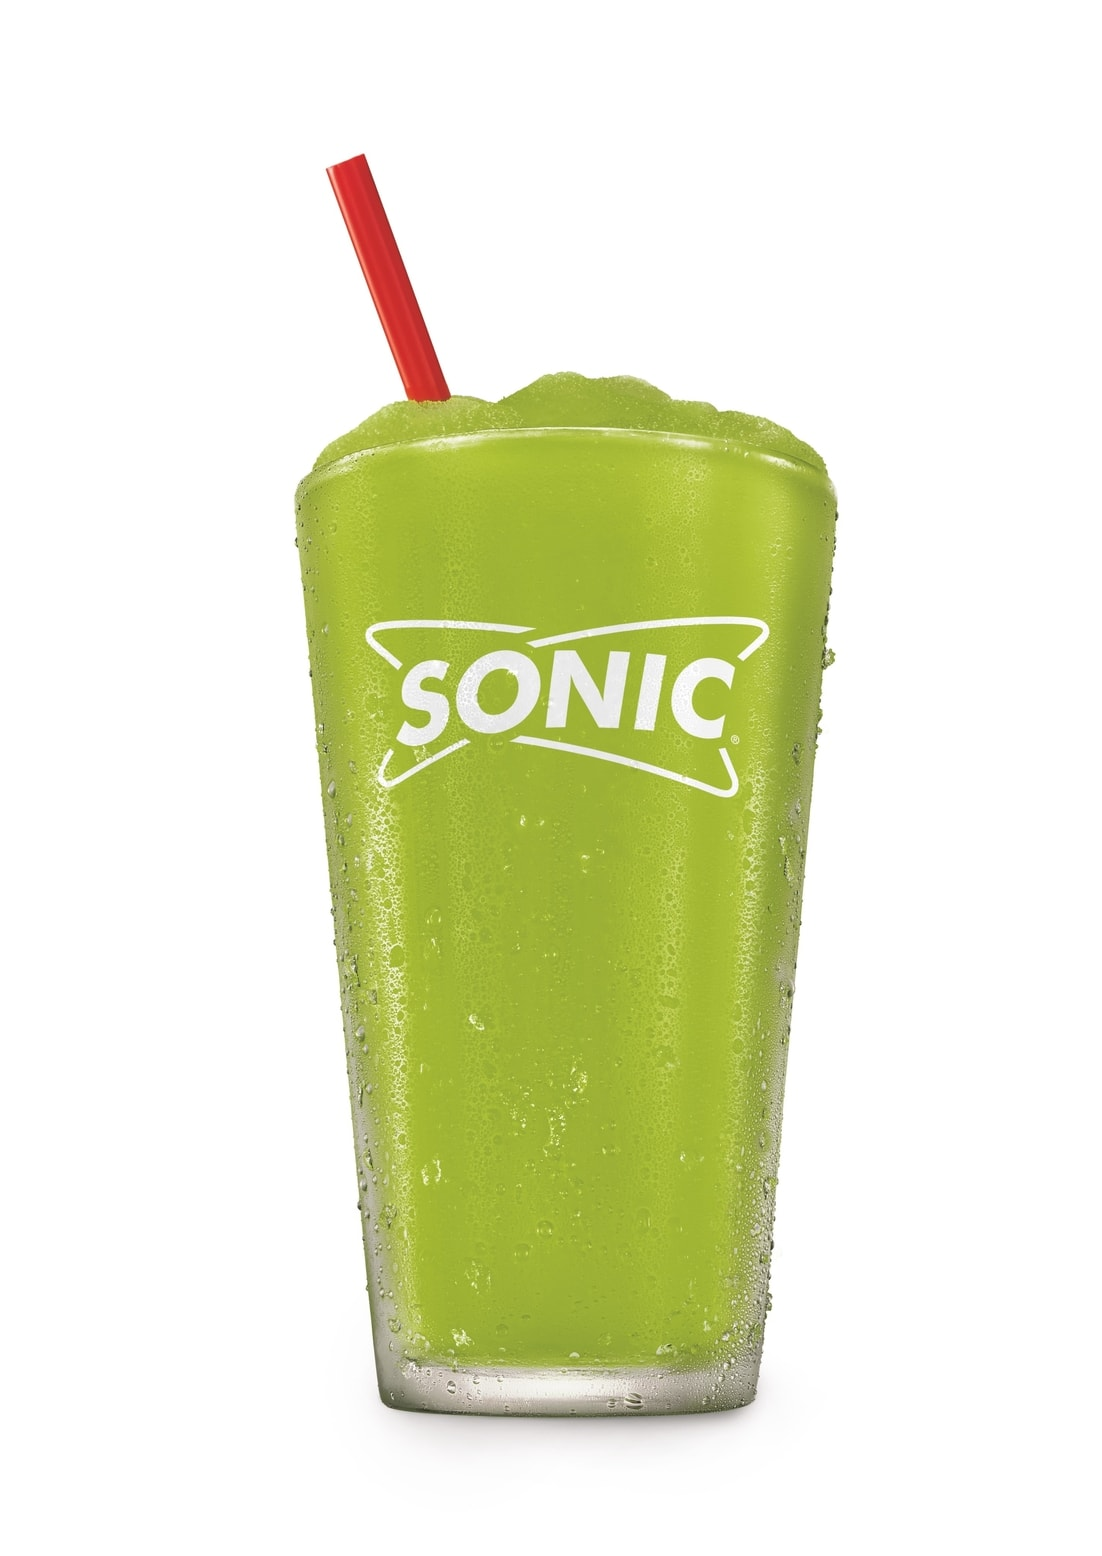 Sonic Announces Pickle Juice Slushes Coming This Summer